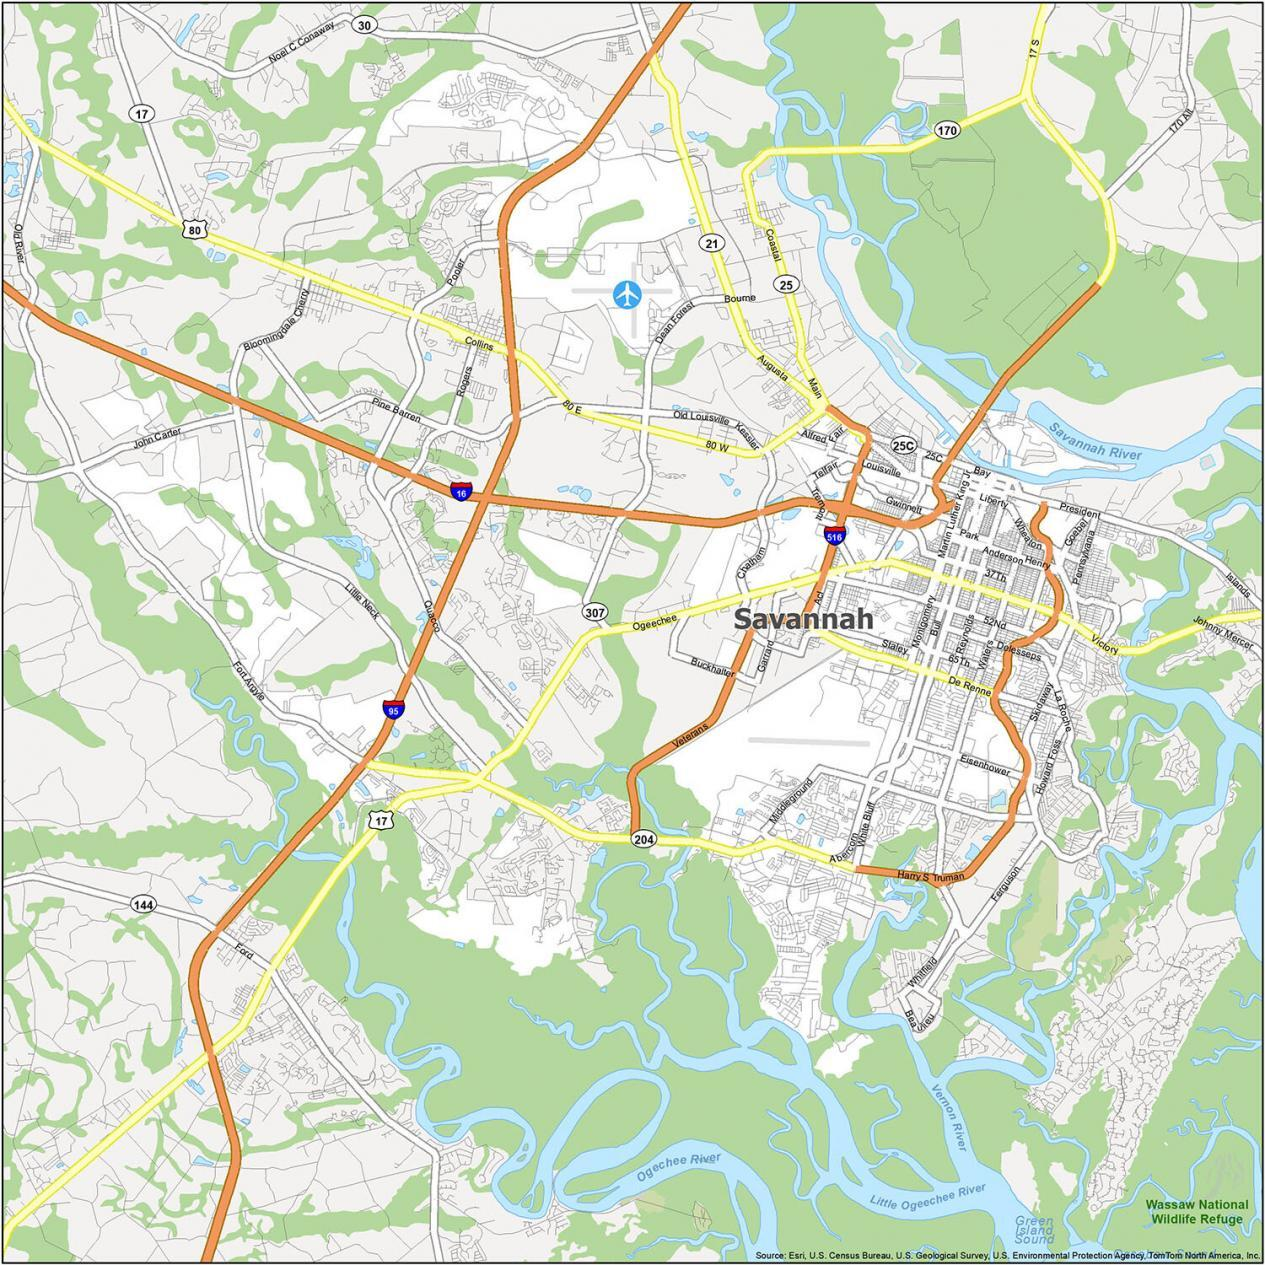 Savannah Road Map